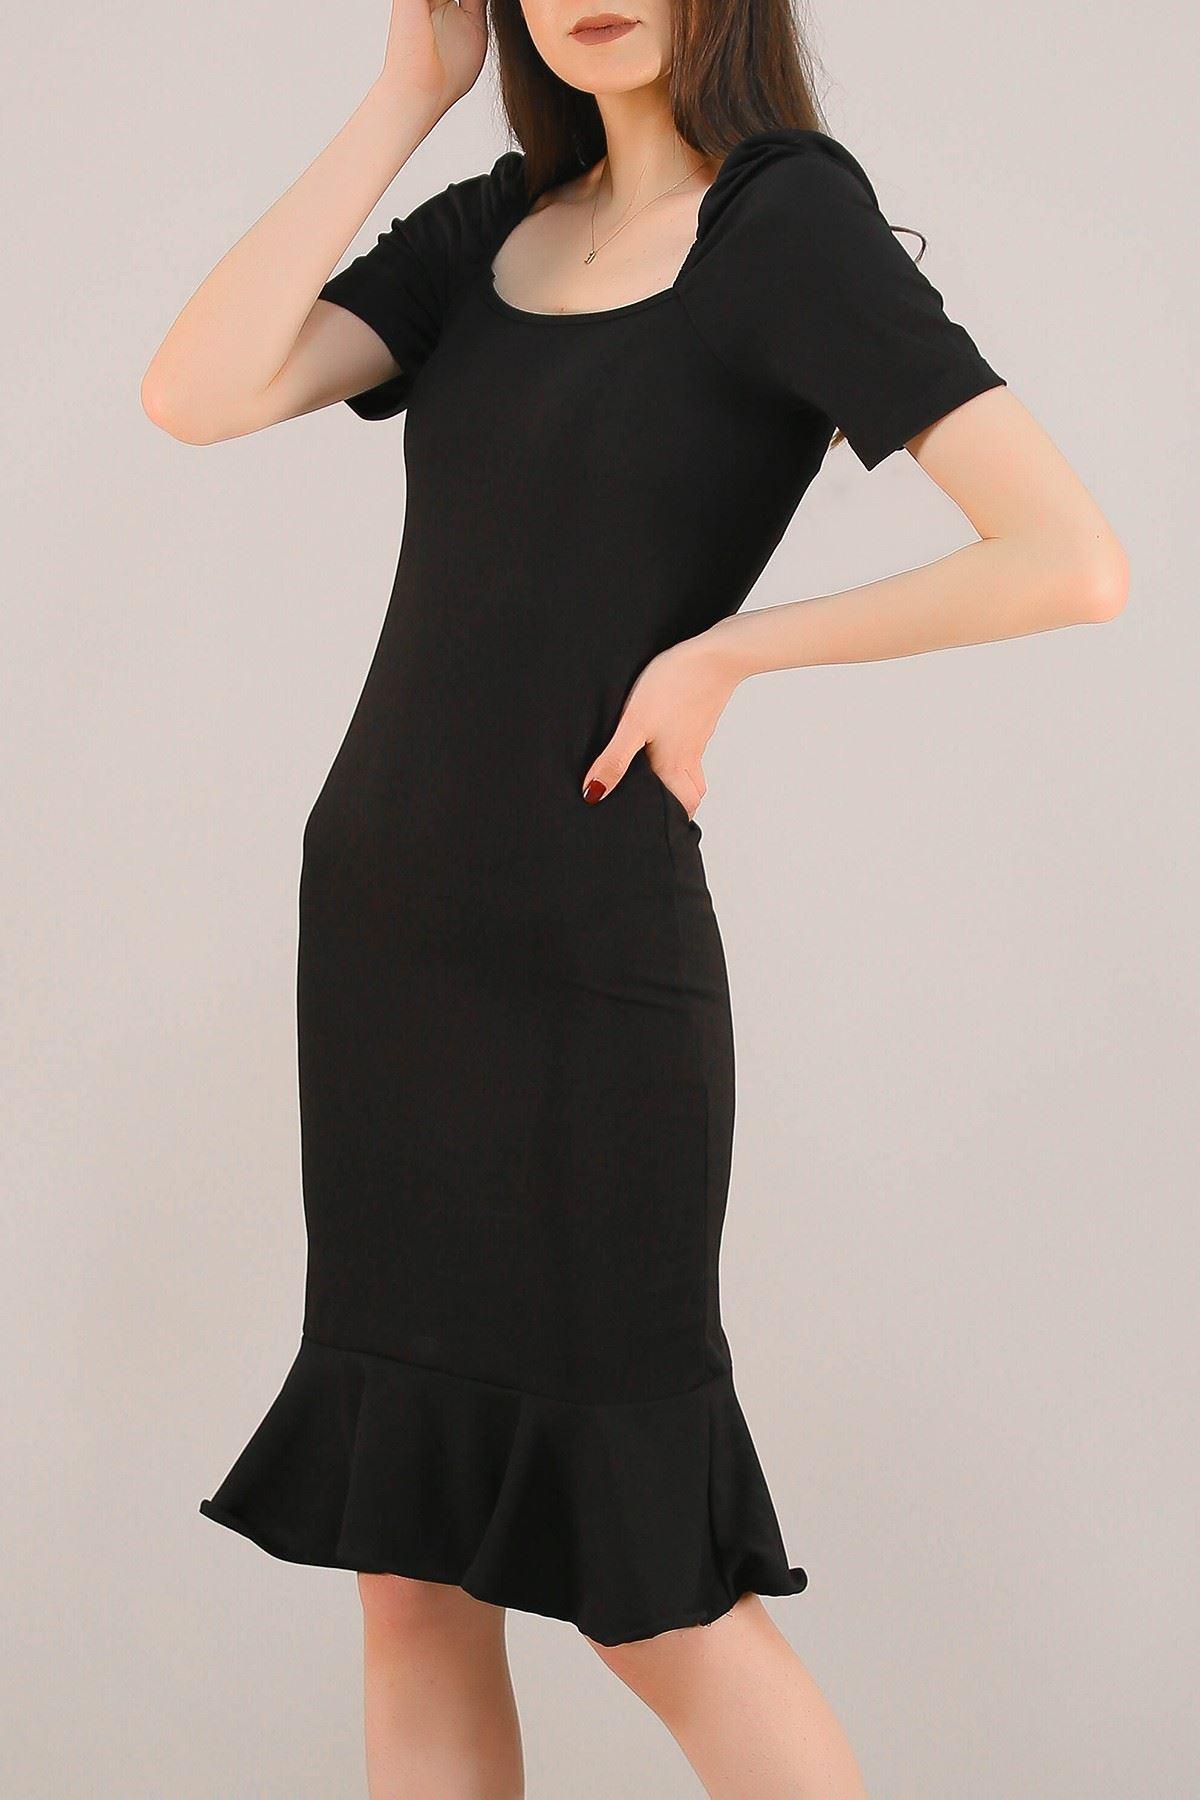 Prenses Kol Kaşkorse Elbise Siyah - 5198.994.